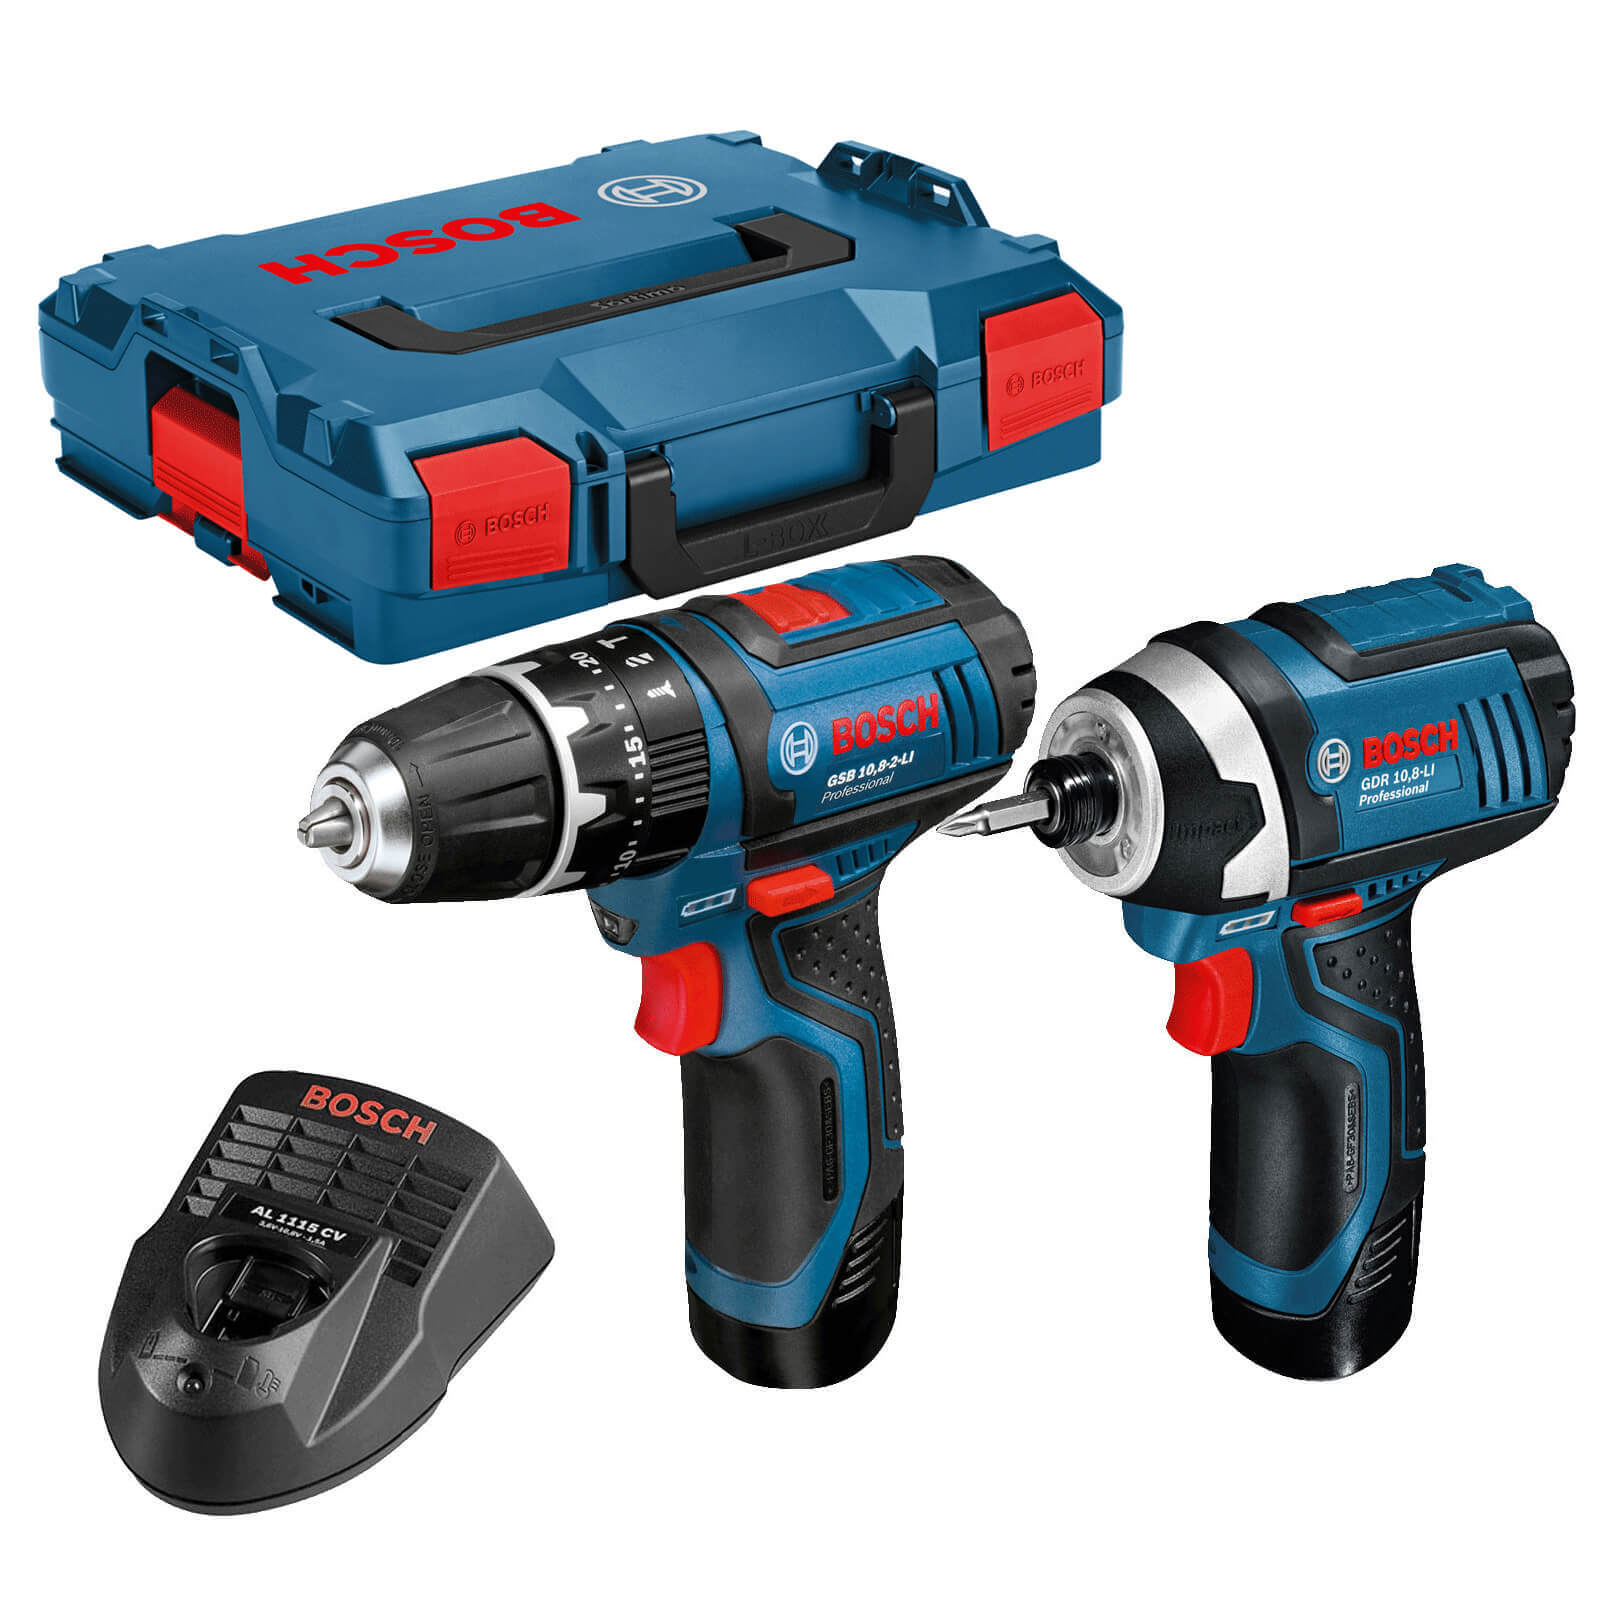 Bosch GSB 10.8 2 LI 10.8v Cordless Combi Drill GDR 10.8 LI Impact Driver with 2 Li ion Batteries 2ah L Boxx